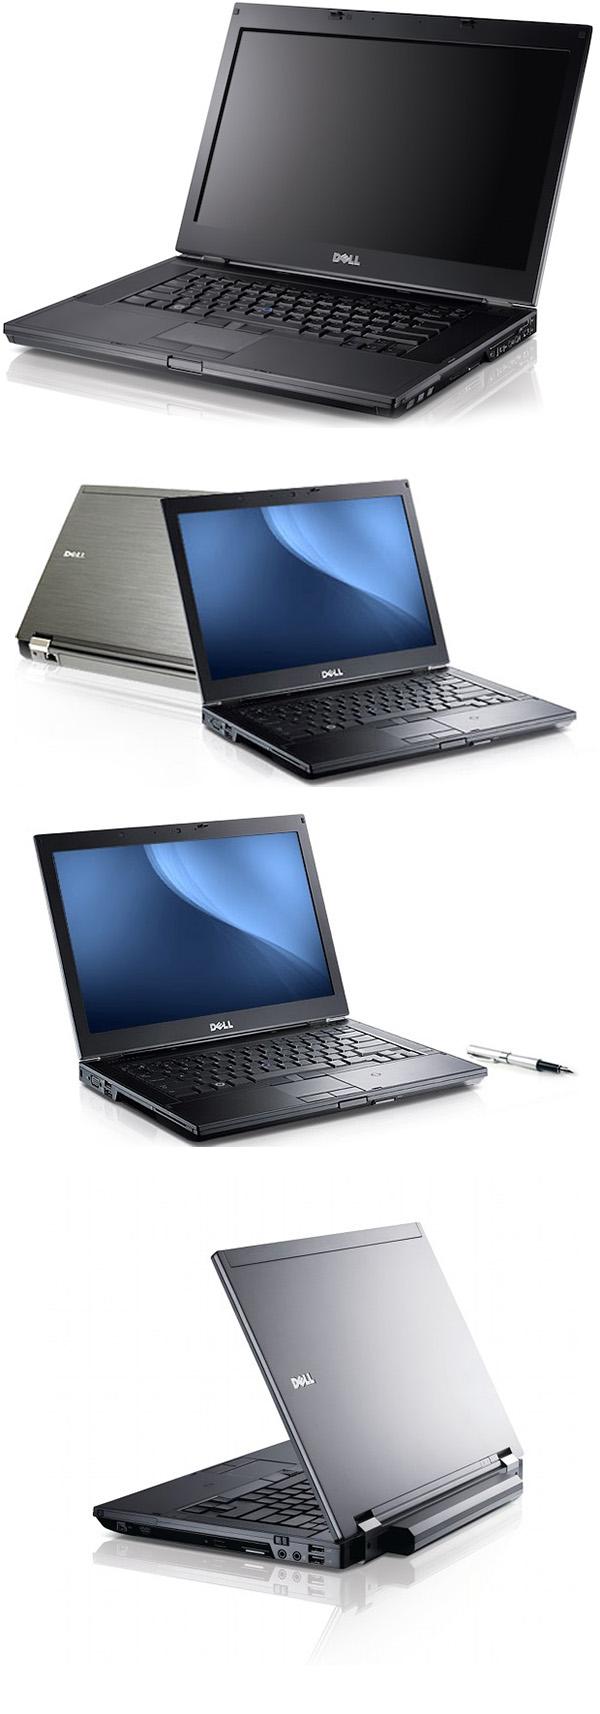 Dell E6410 (Core i5, 4GB RAM, 250GB HDD, WebCam, Certified Used)